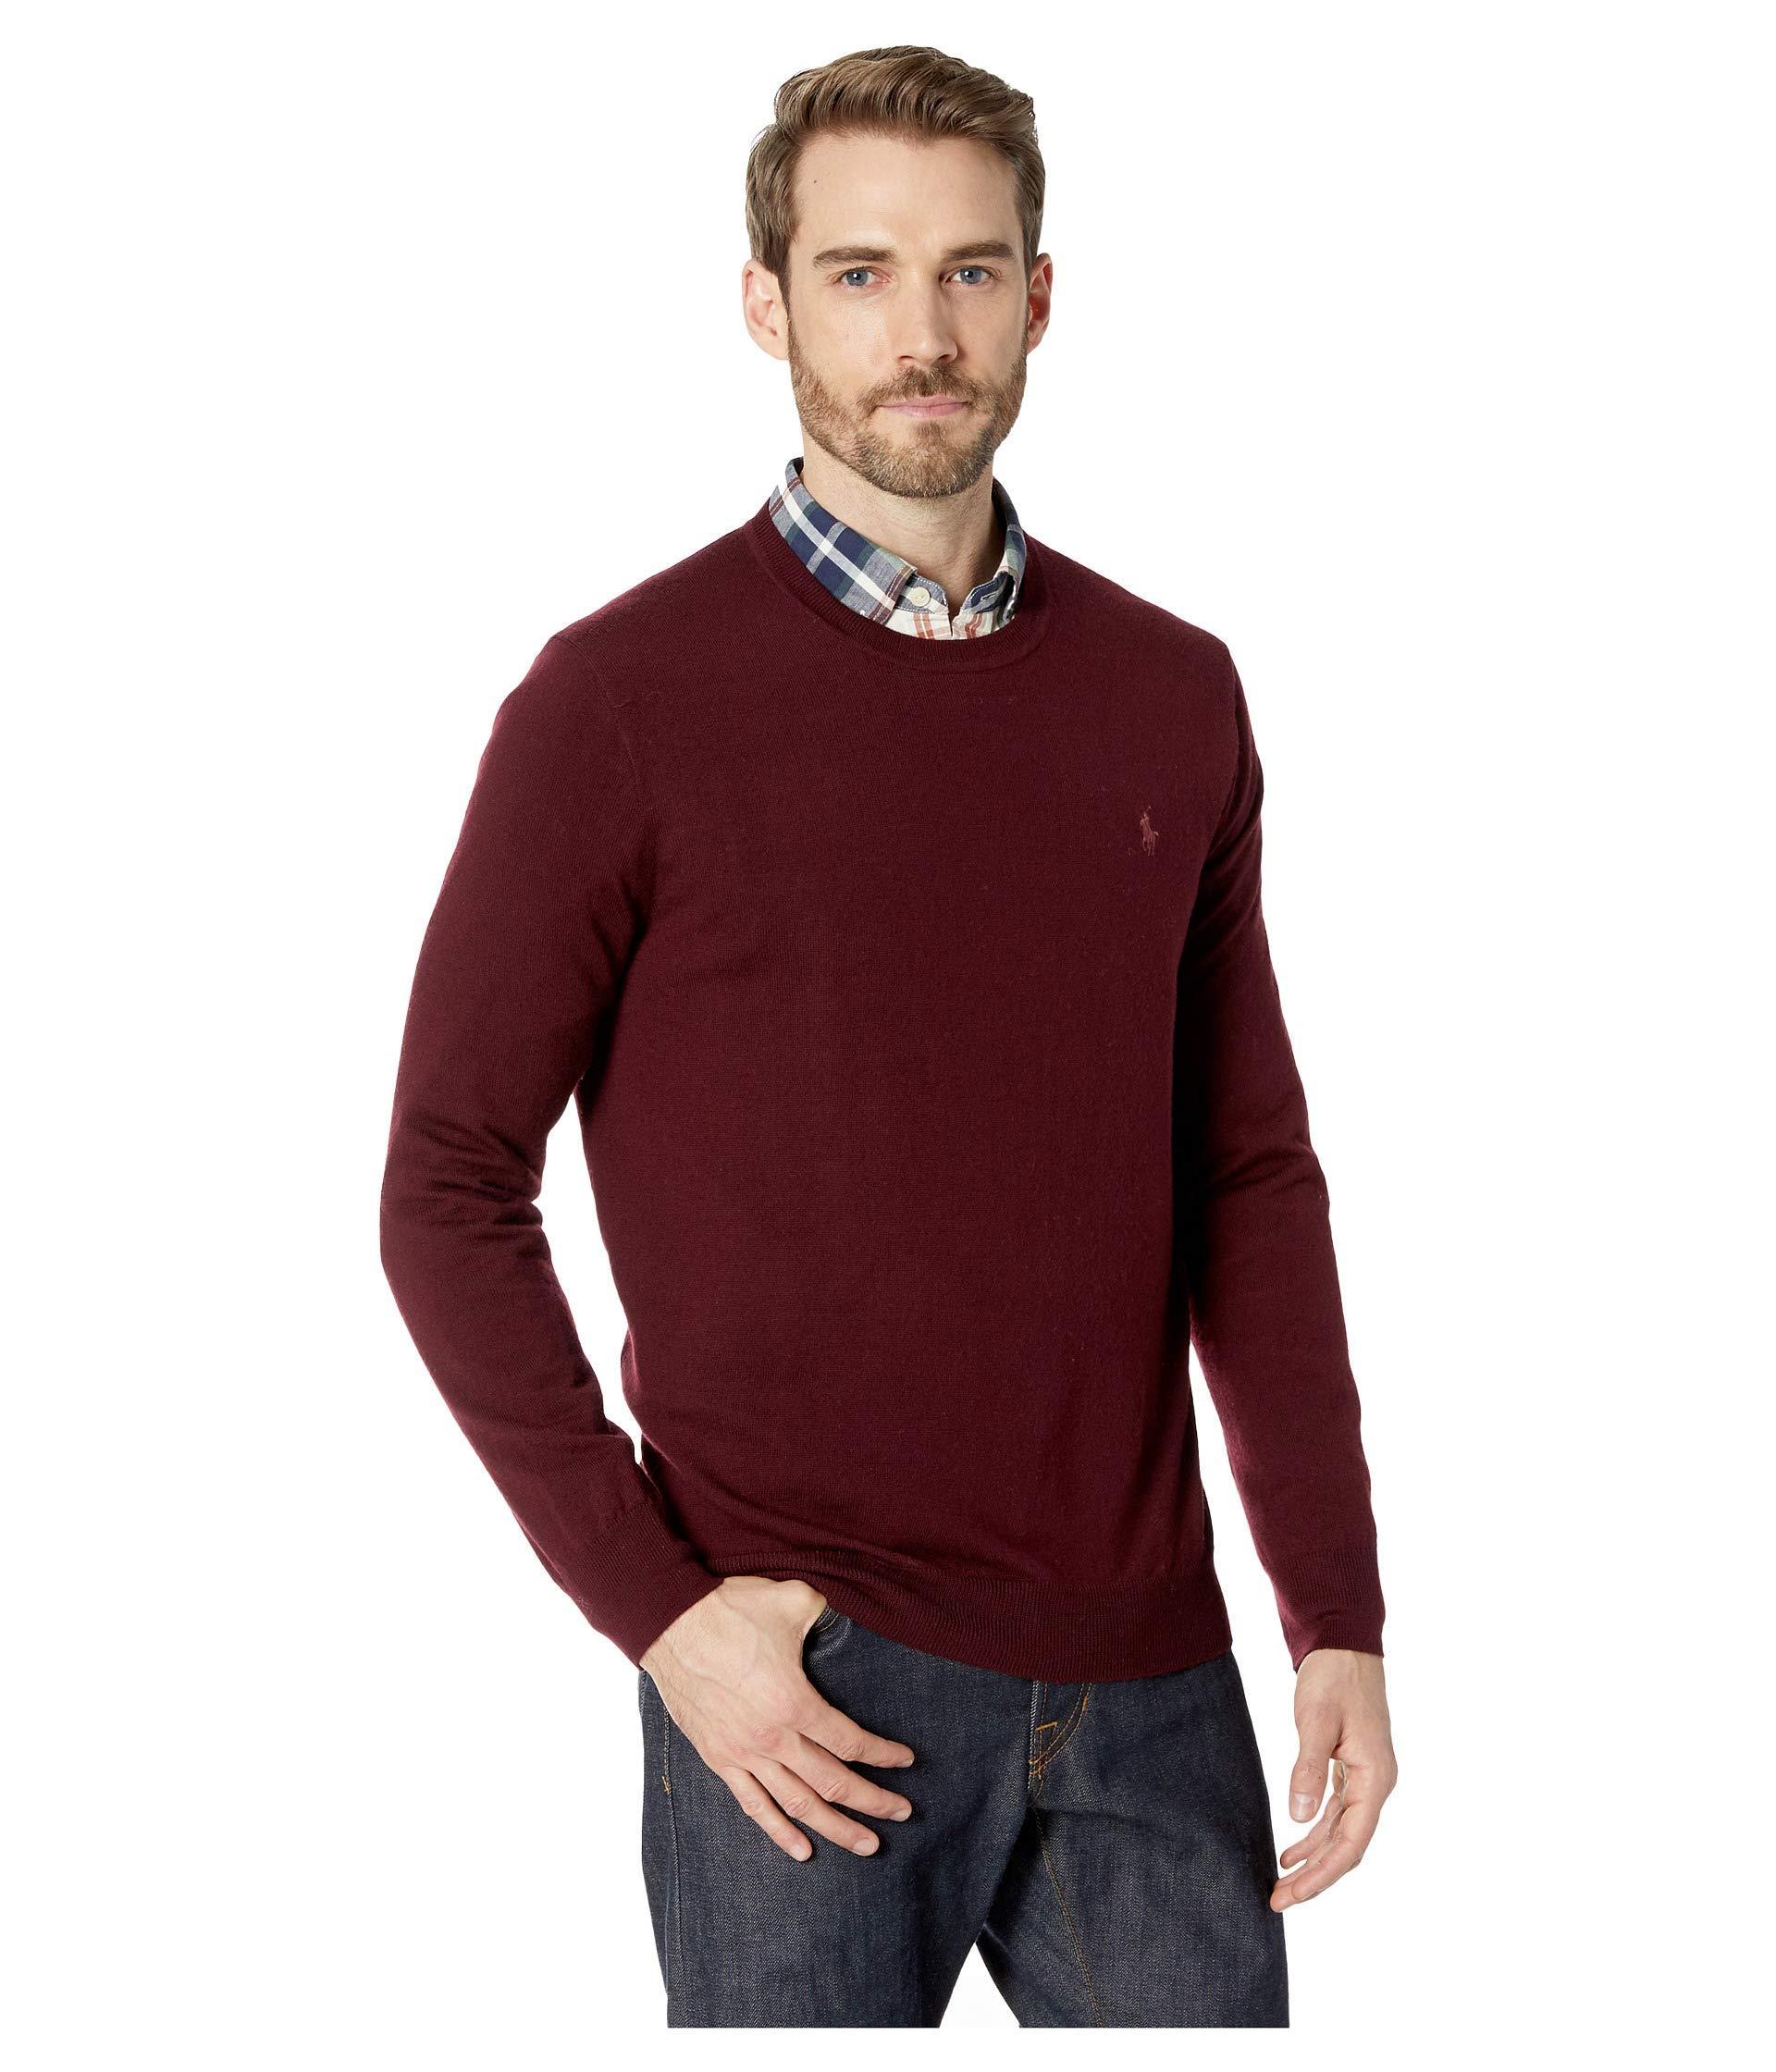 dd60422ff05ac Lyst - Polo Ralph Lauren Washable Merino Crew Neck Sweater in Red ...